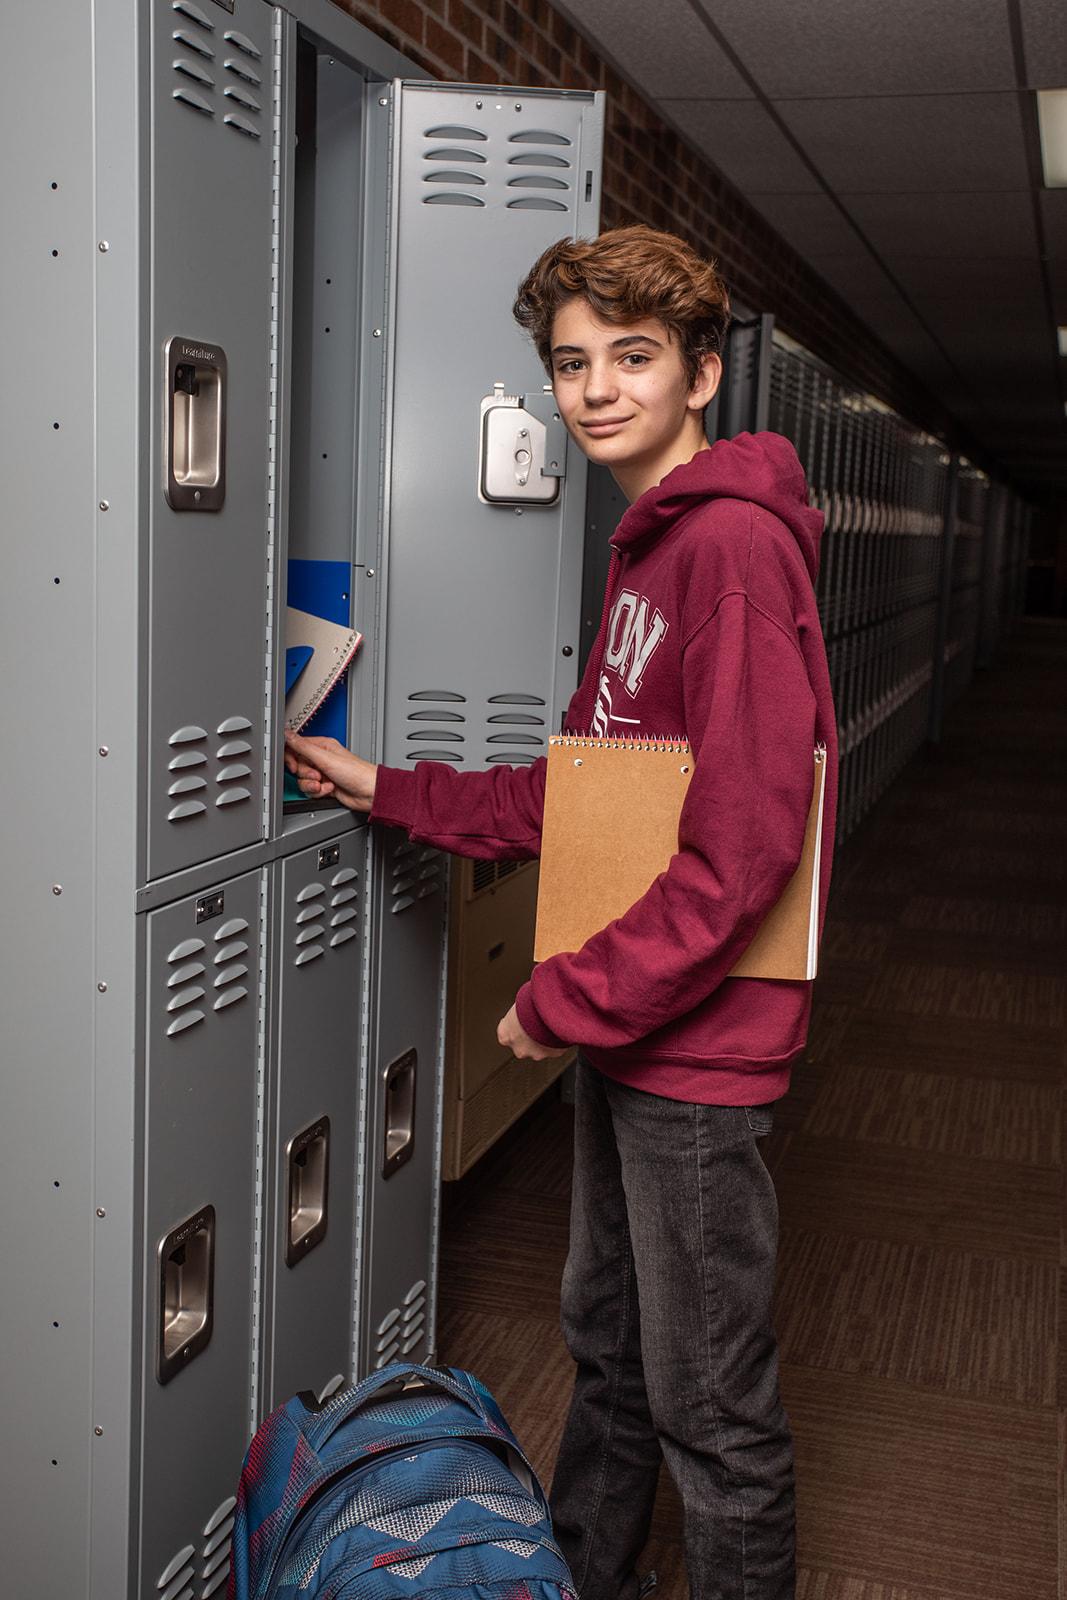 High School Boy at Locker